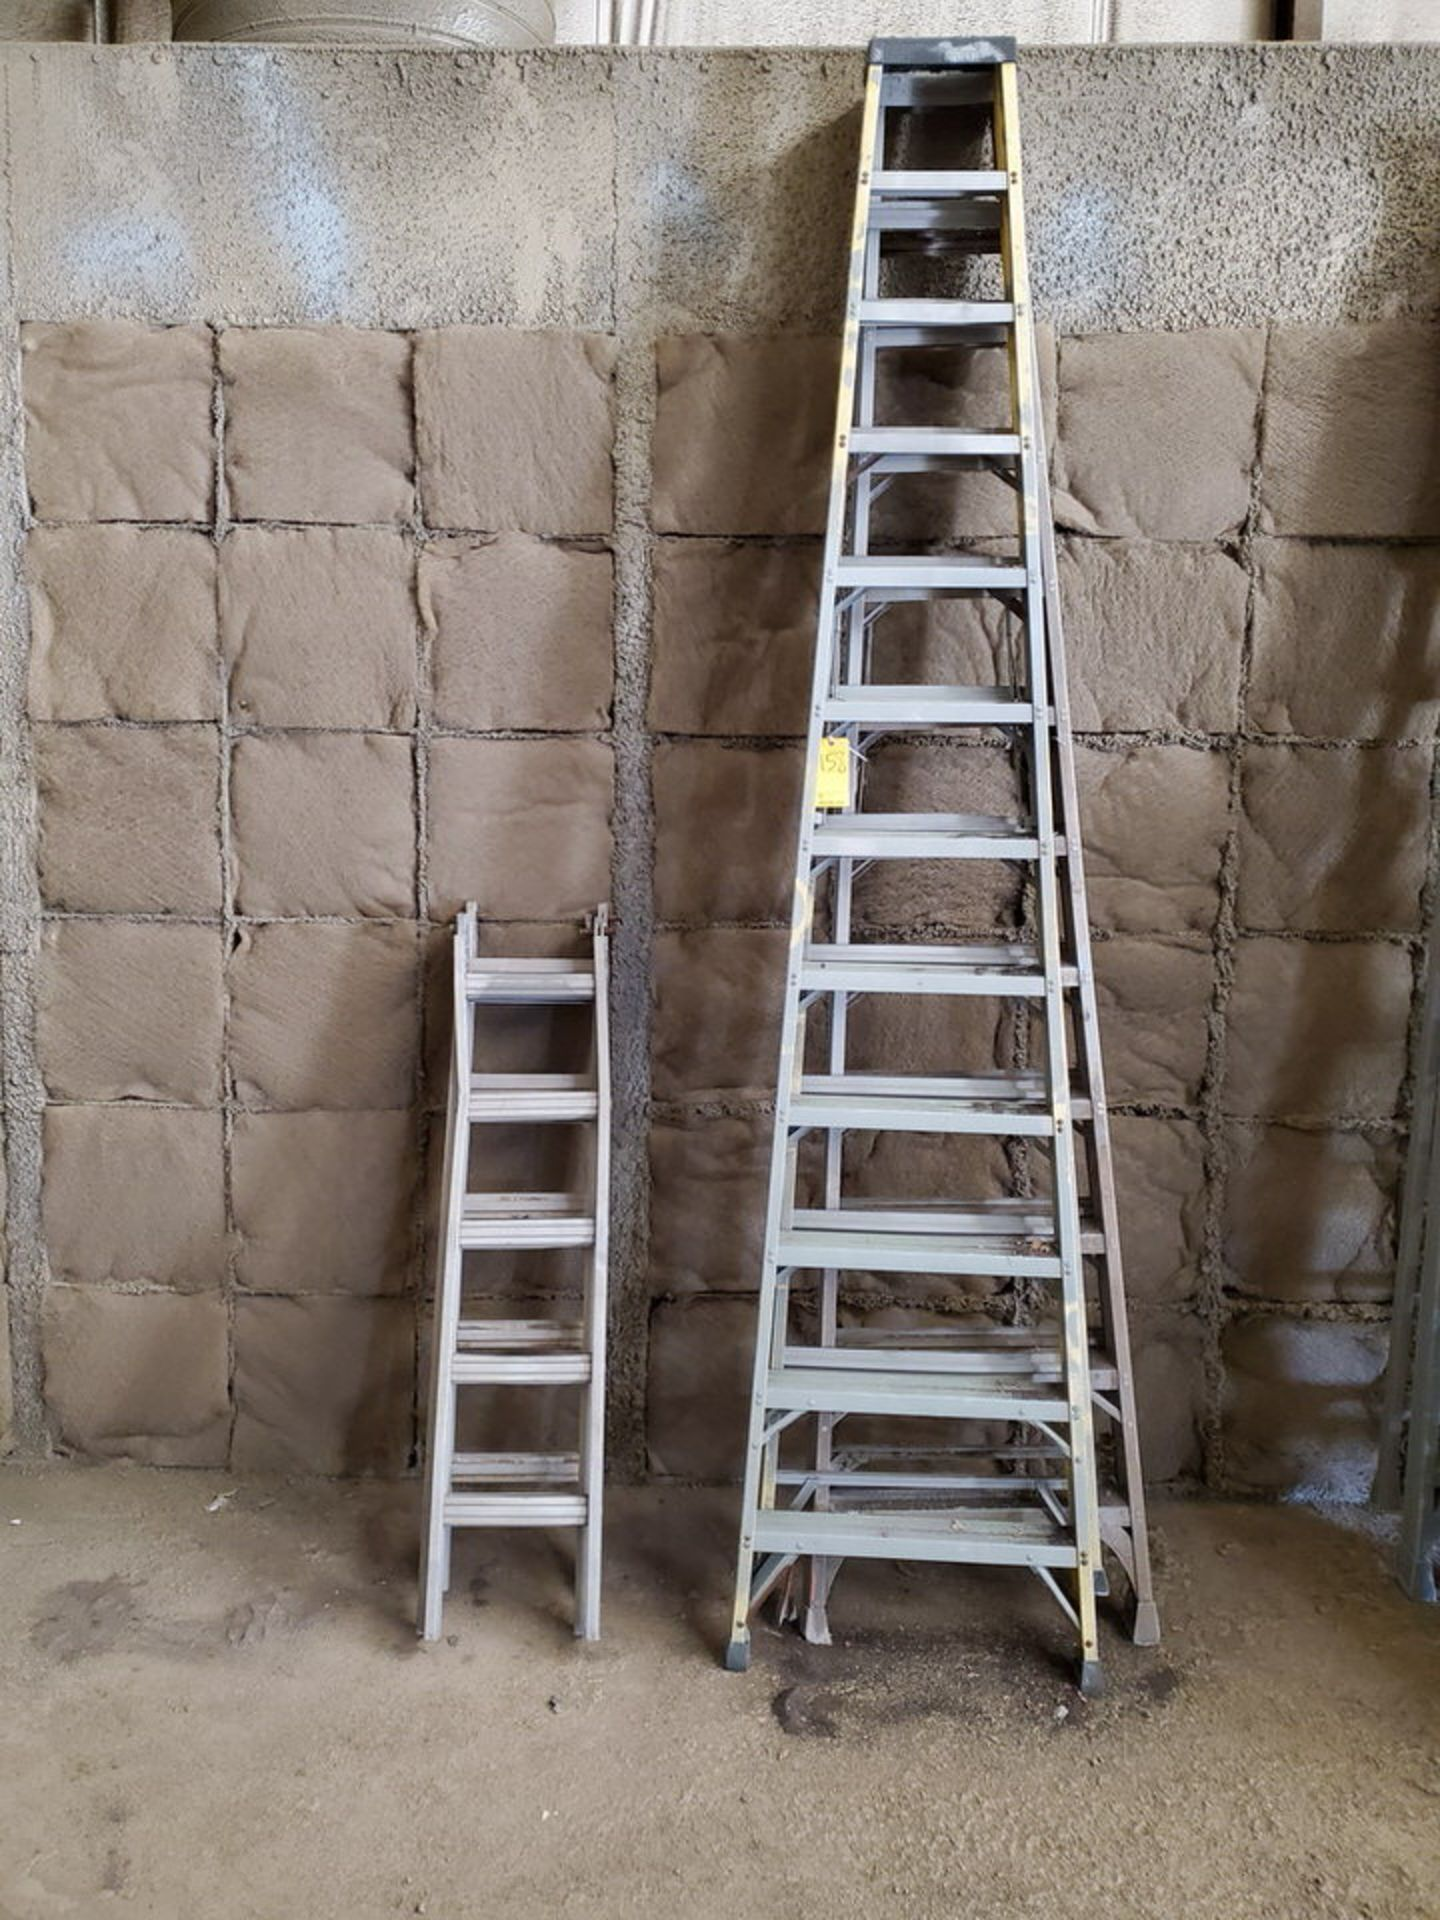 (4) Assorted Fiberglass Platform Ladders Sizes: (2) 4', (2) 14'